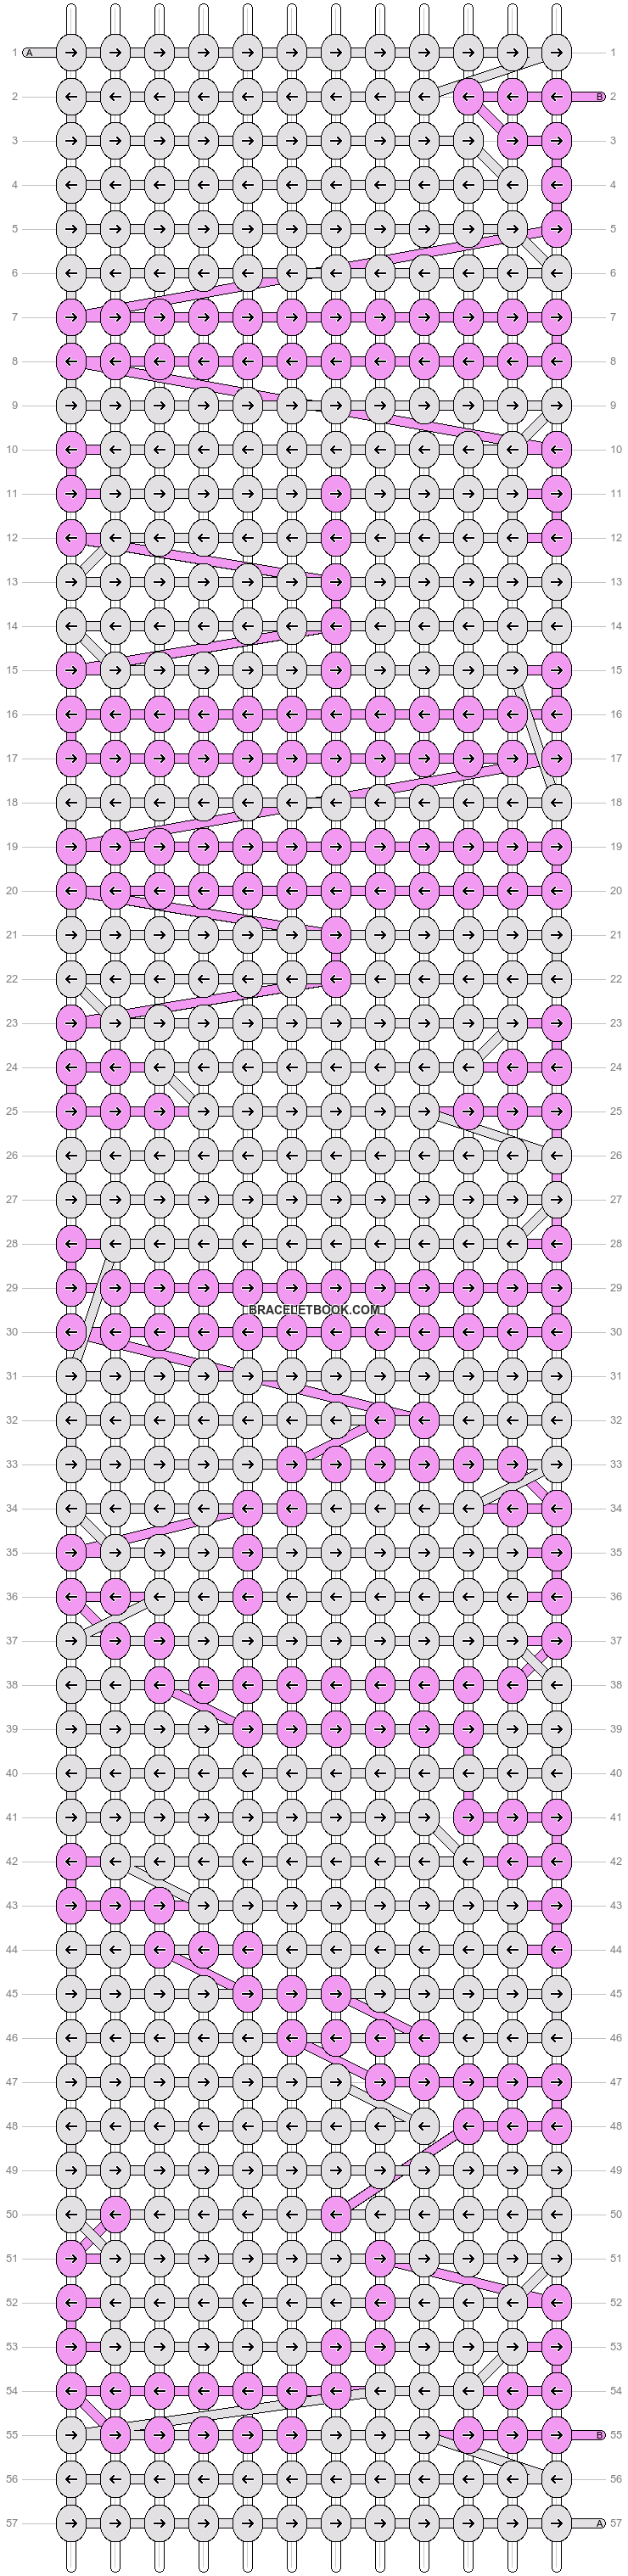 Alpha Pattern #18860 added by lemonhead